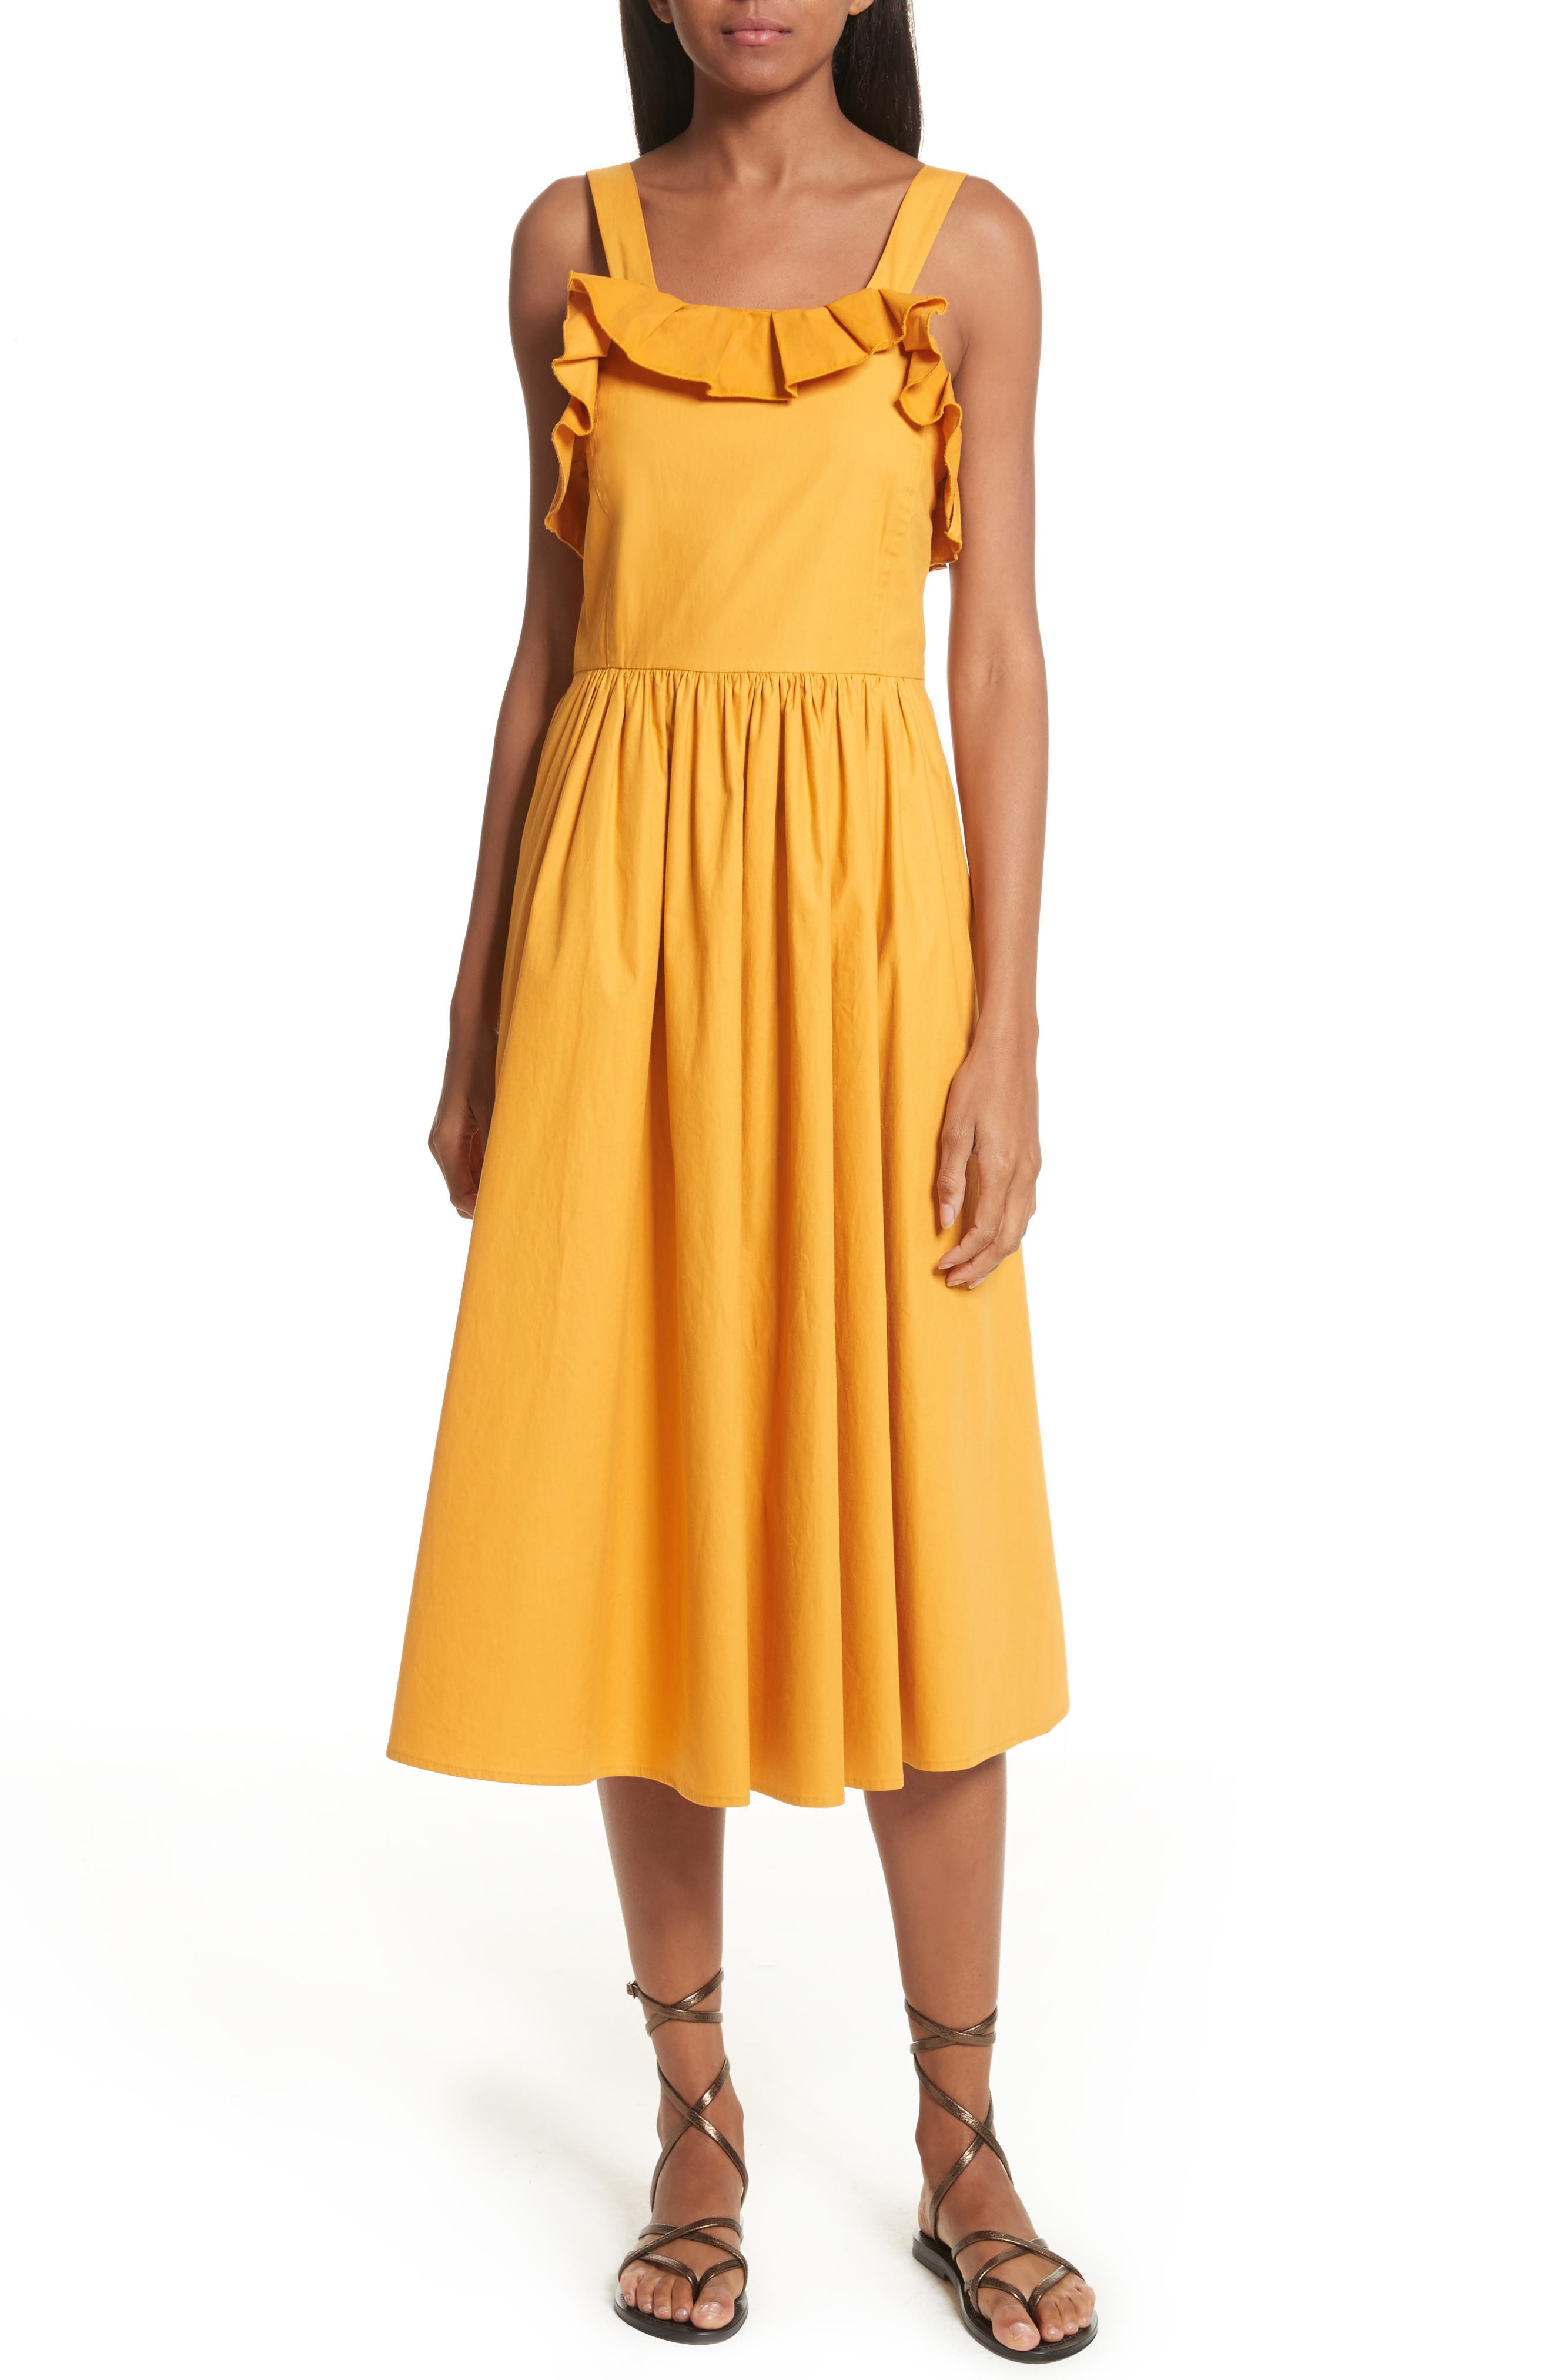 Sunrise Ruffle Midi Dress,                             Main thumbnail 1, color,                             800